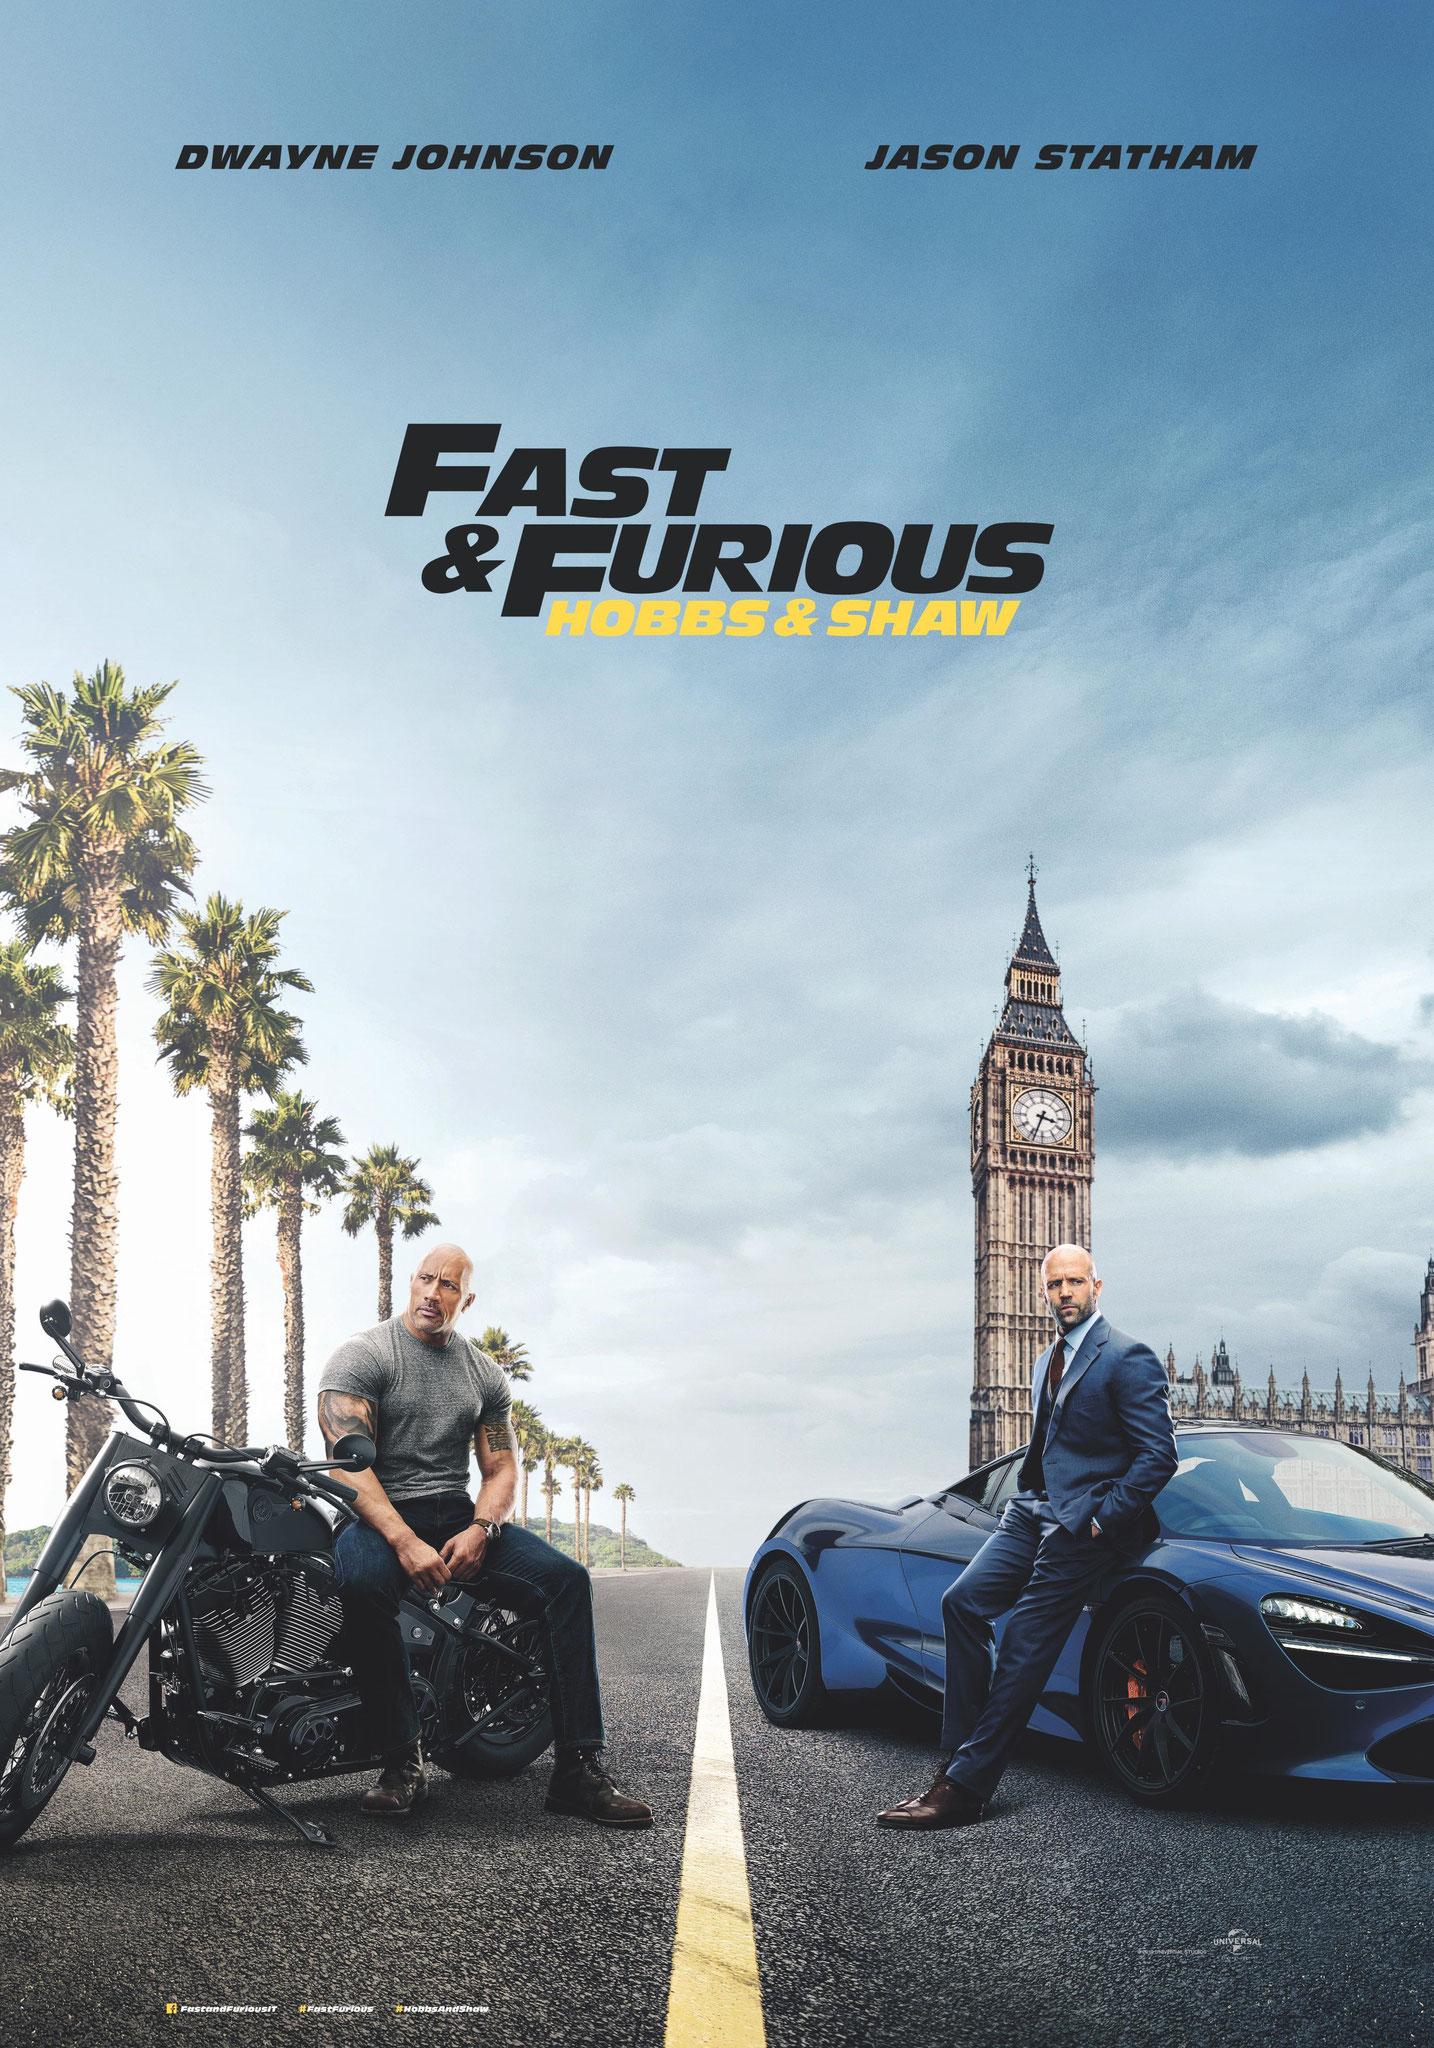 FAST & FURIOUS - HOBBS & SHAW venerdì 9, sabato 10, domenica 11, lunedì 12, martedì 13, mercoledì 14: ore 21:15 giovedì 15: ore 21:00  #FastFuriousHobbsShaw